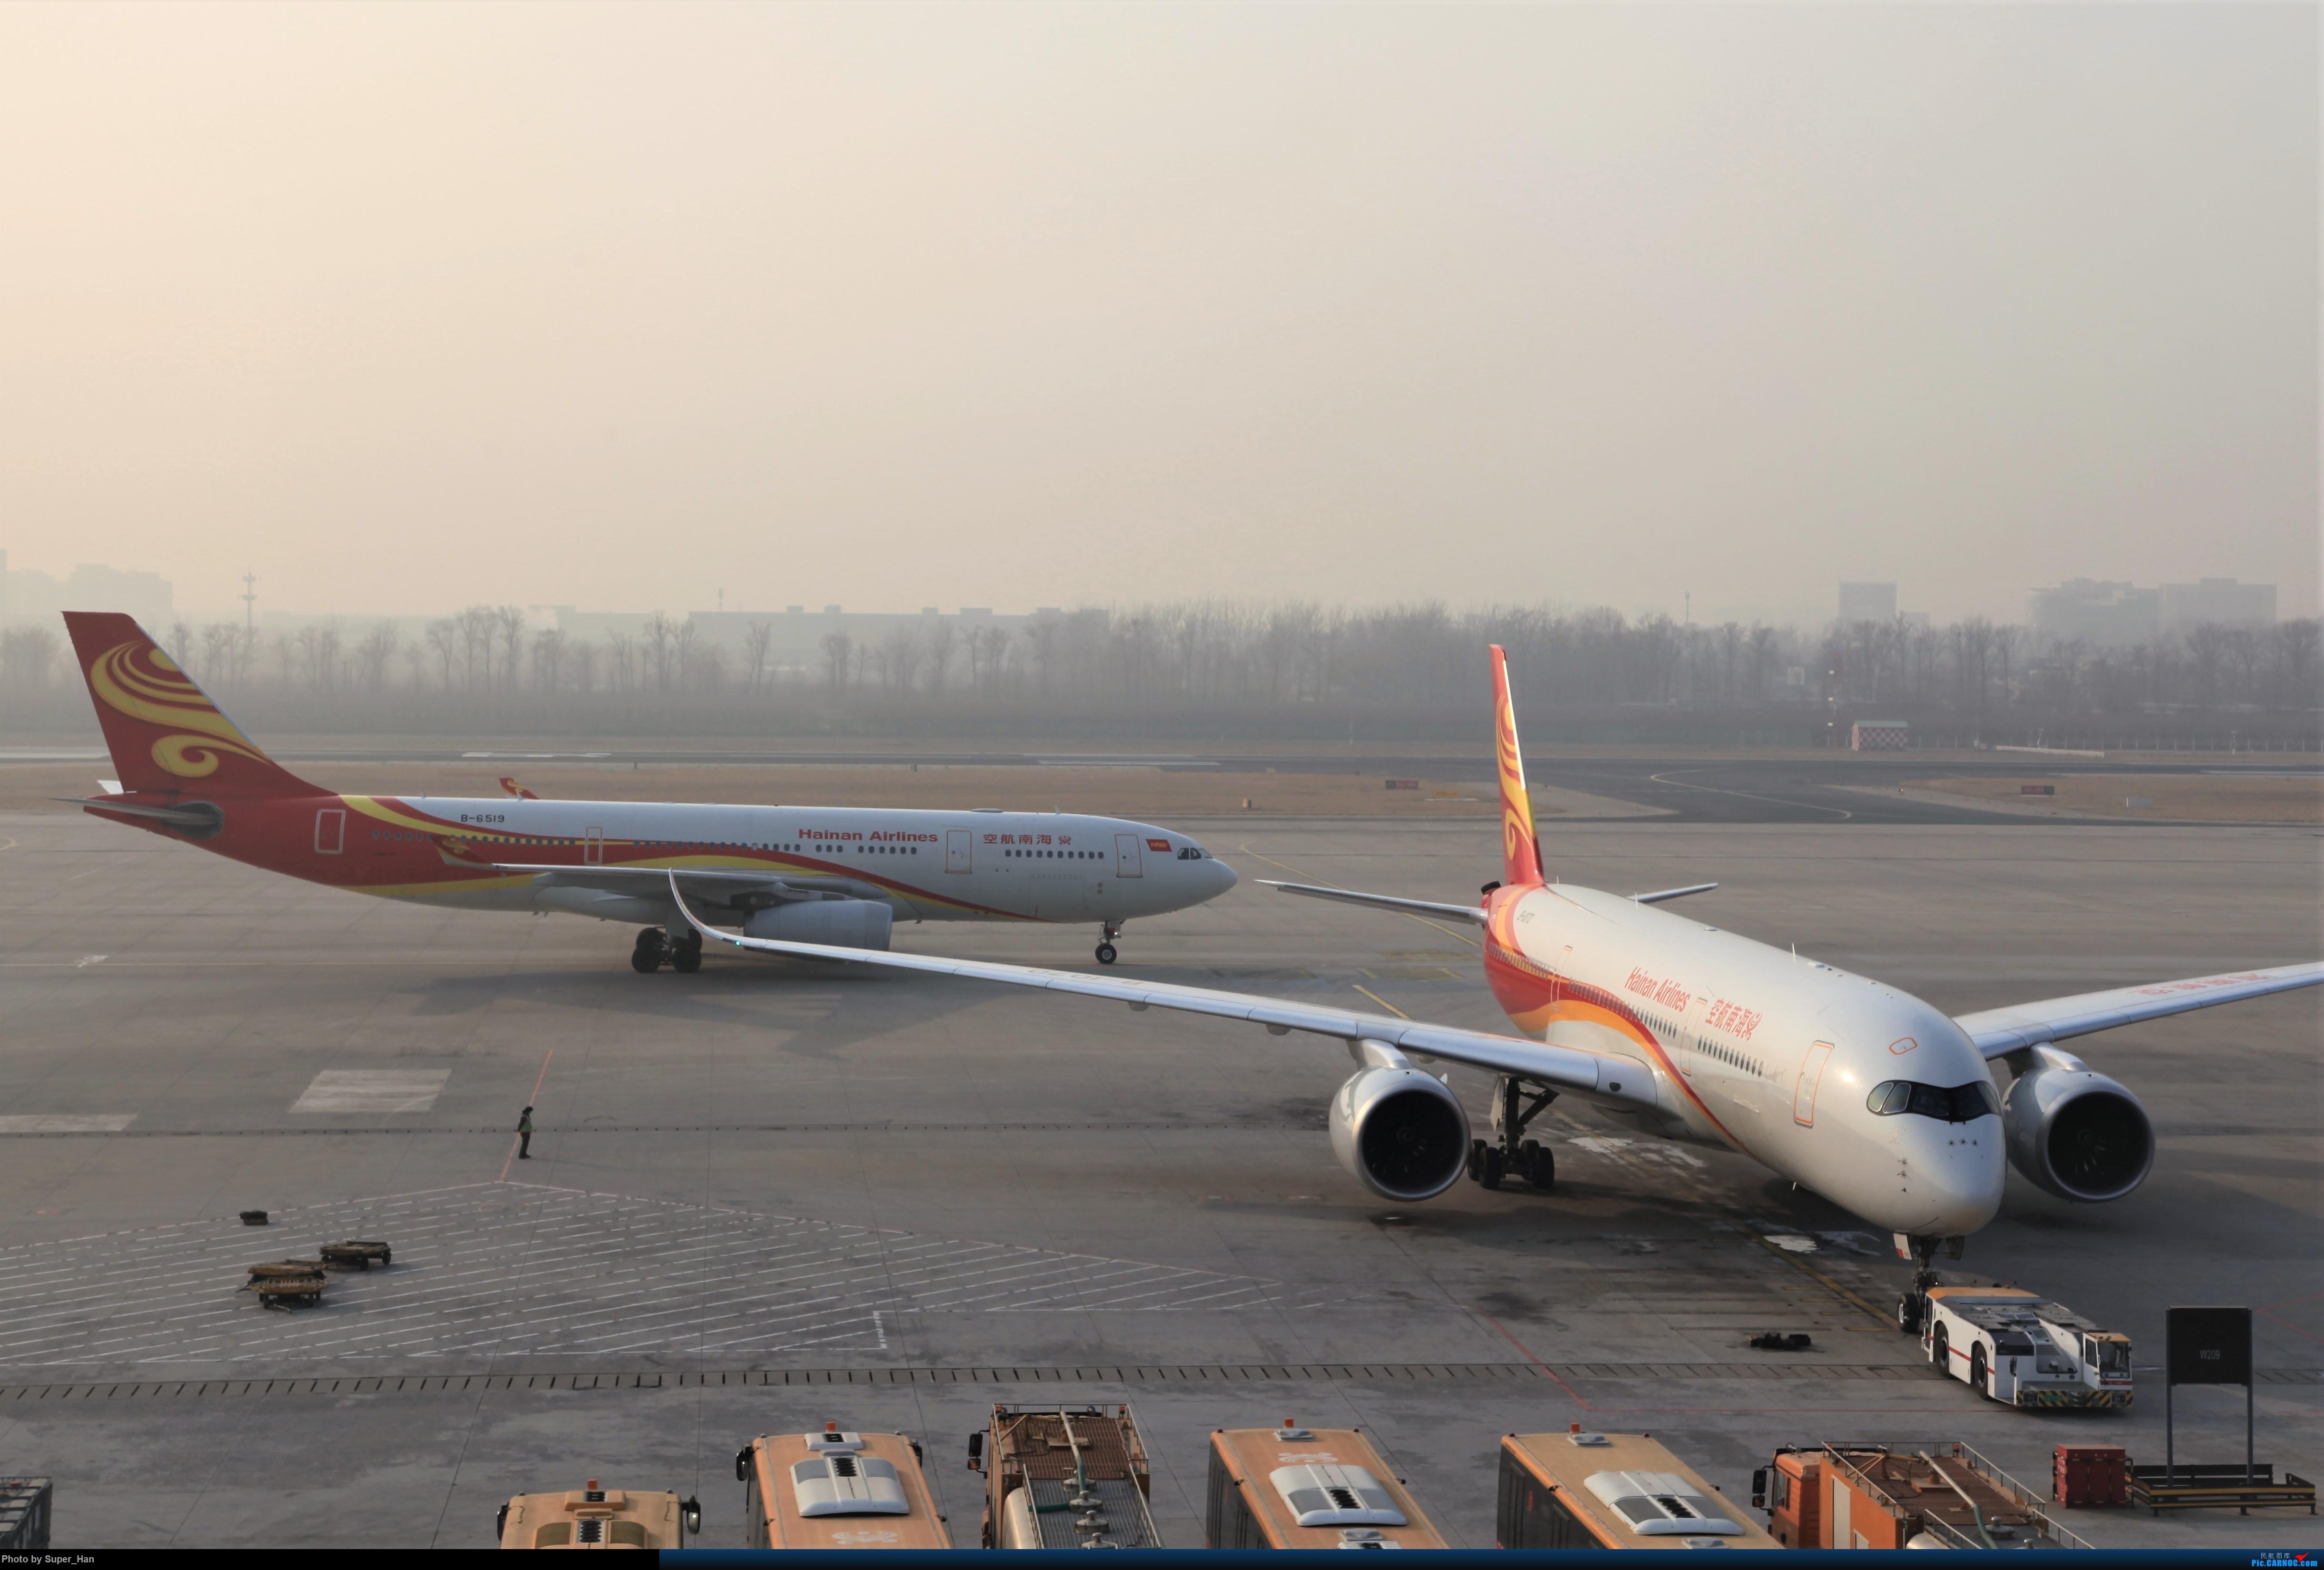 Re:[原创]2019虹桥出发飞北京第一拍 AIRBUS A330-200 B-6519 中国北京首都国际机场